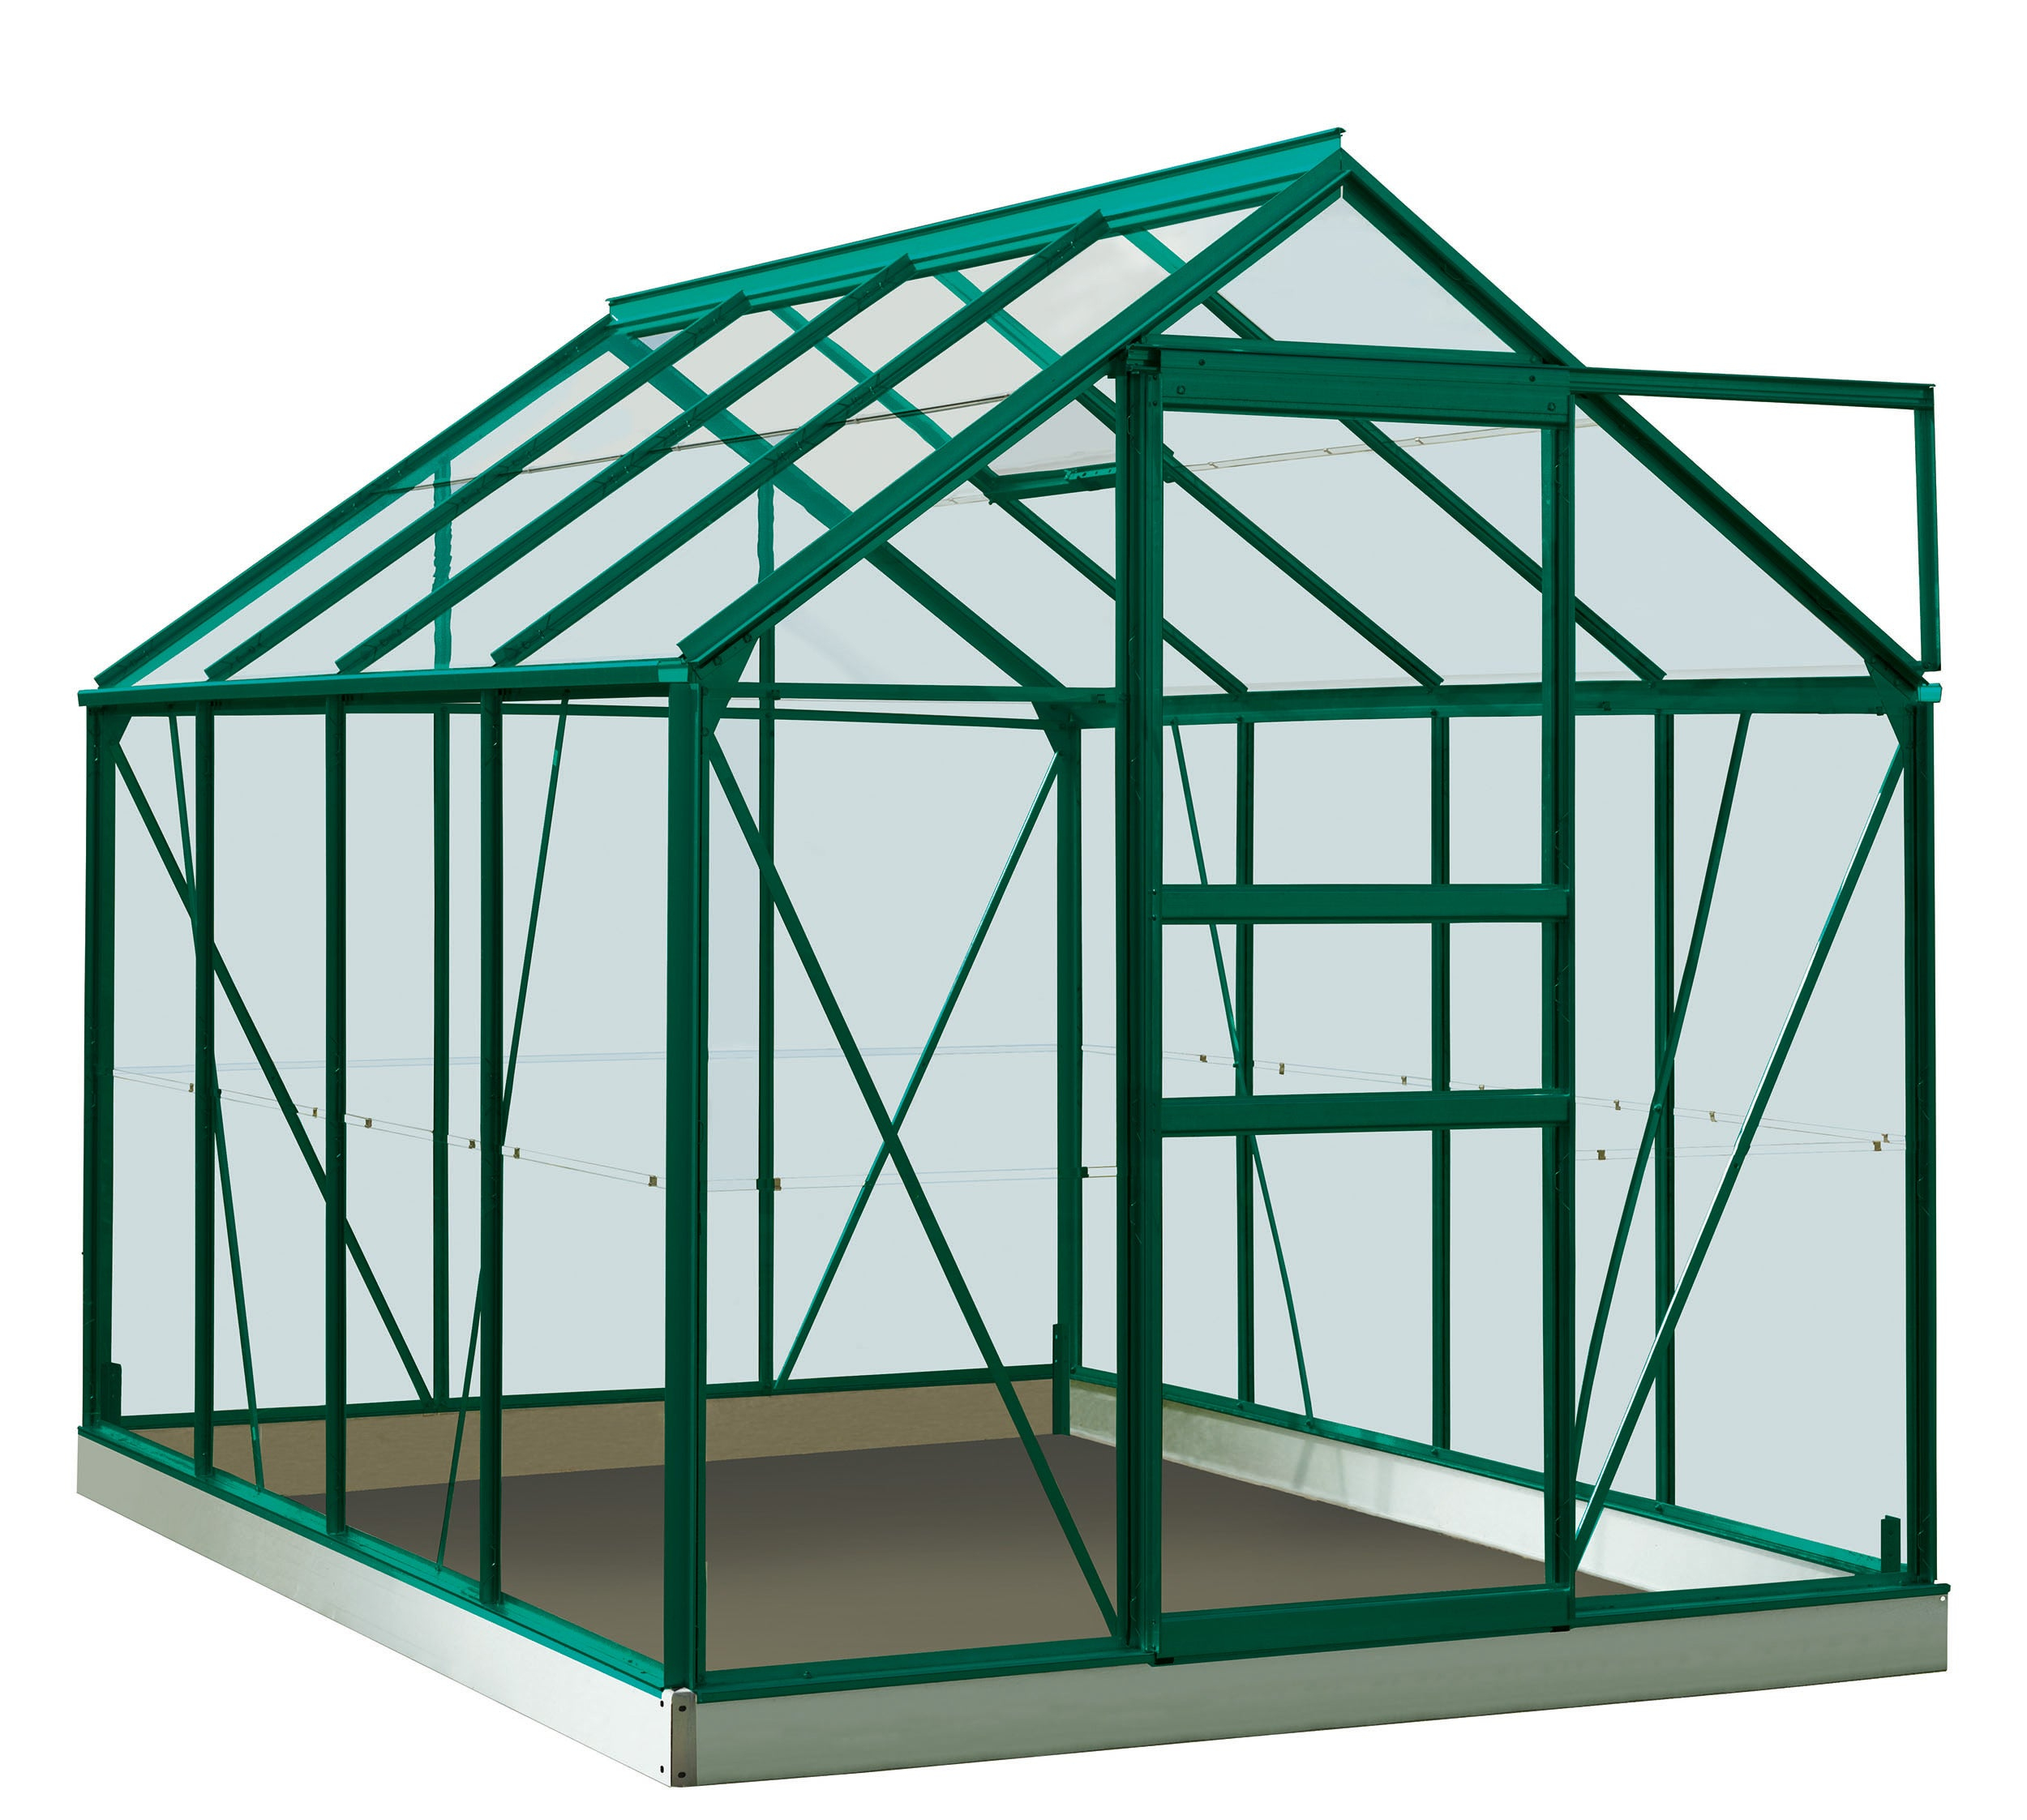 Serre De Jardin En Verre Trempé Rainbow Vert, 4.96 M² destiné Serres De Jardin Leroy Merlin